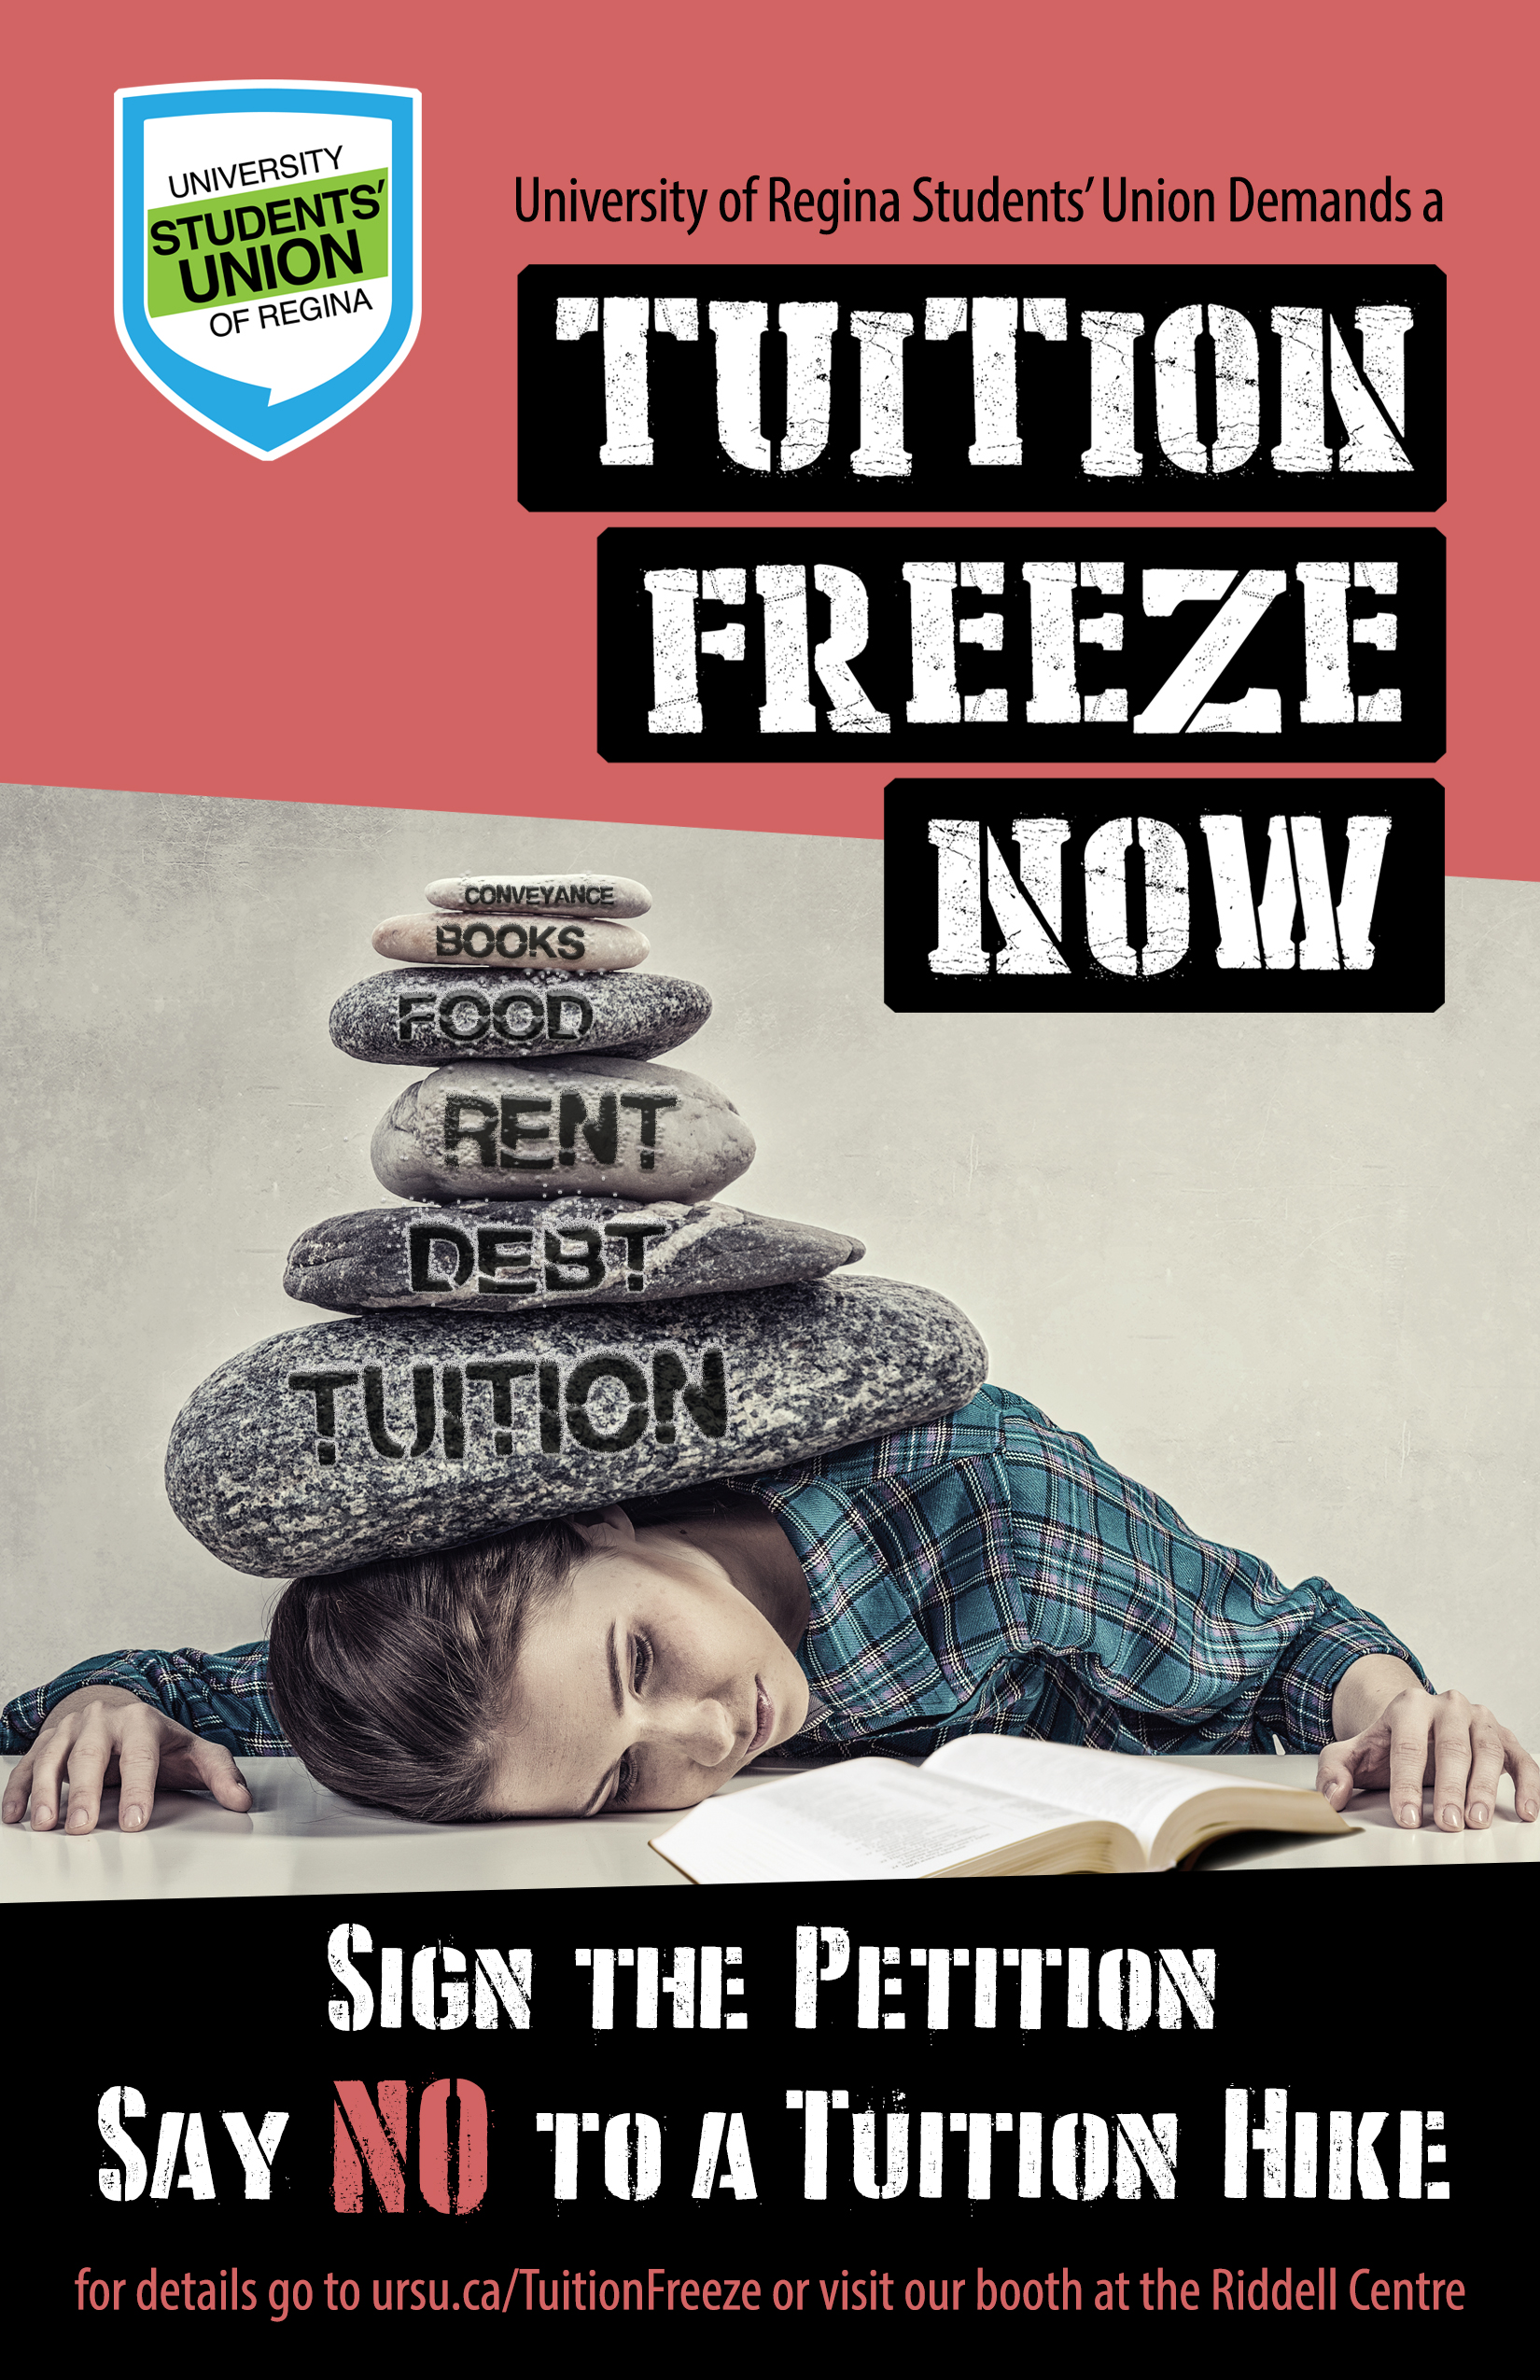 URSU Demands a Tuition Freeze